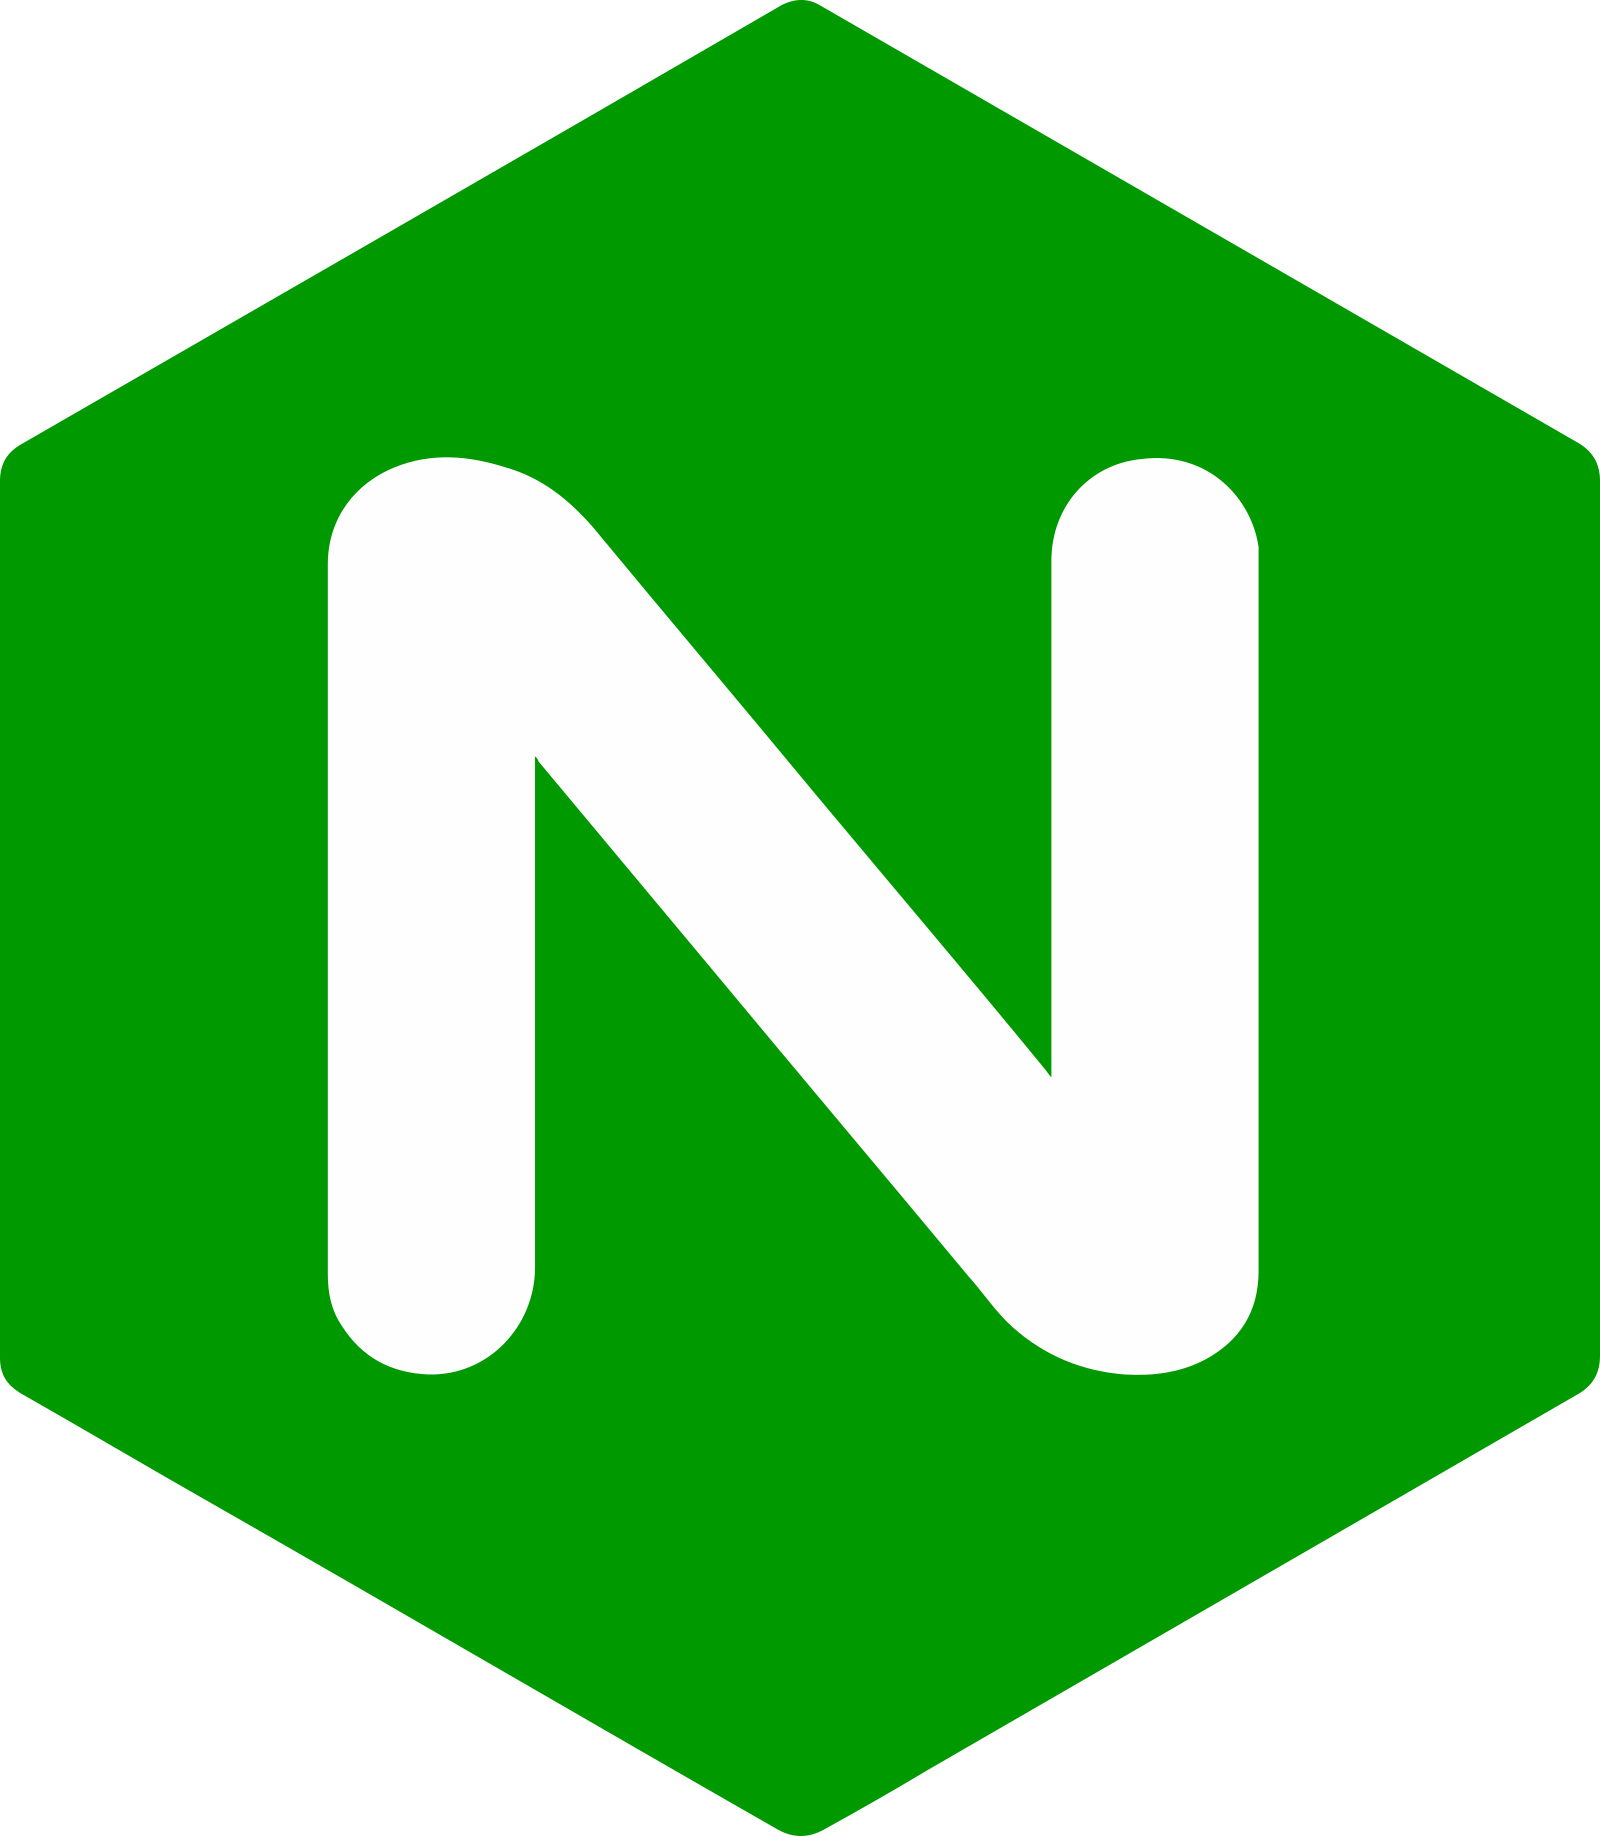 nginx logo 5 - Nginx Logo